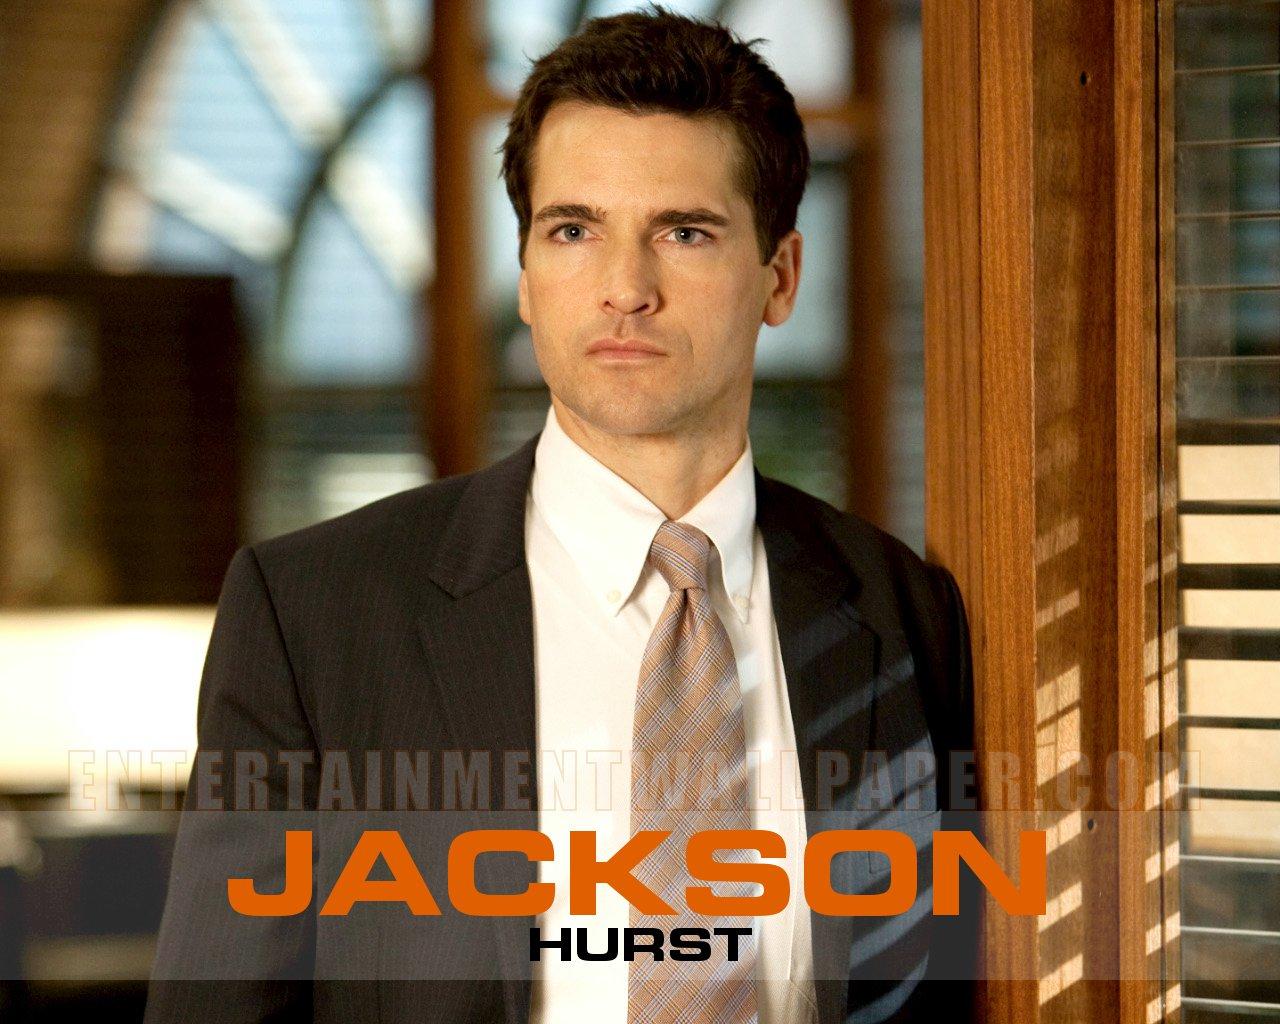 jackson hurst gay